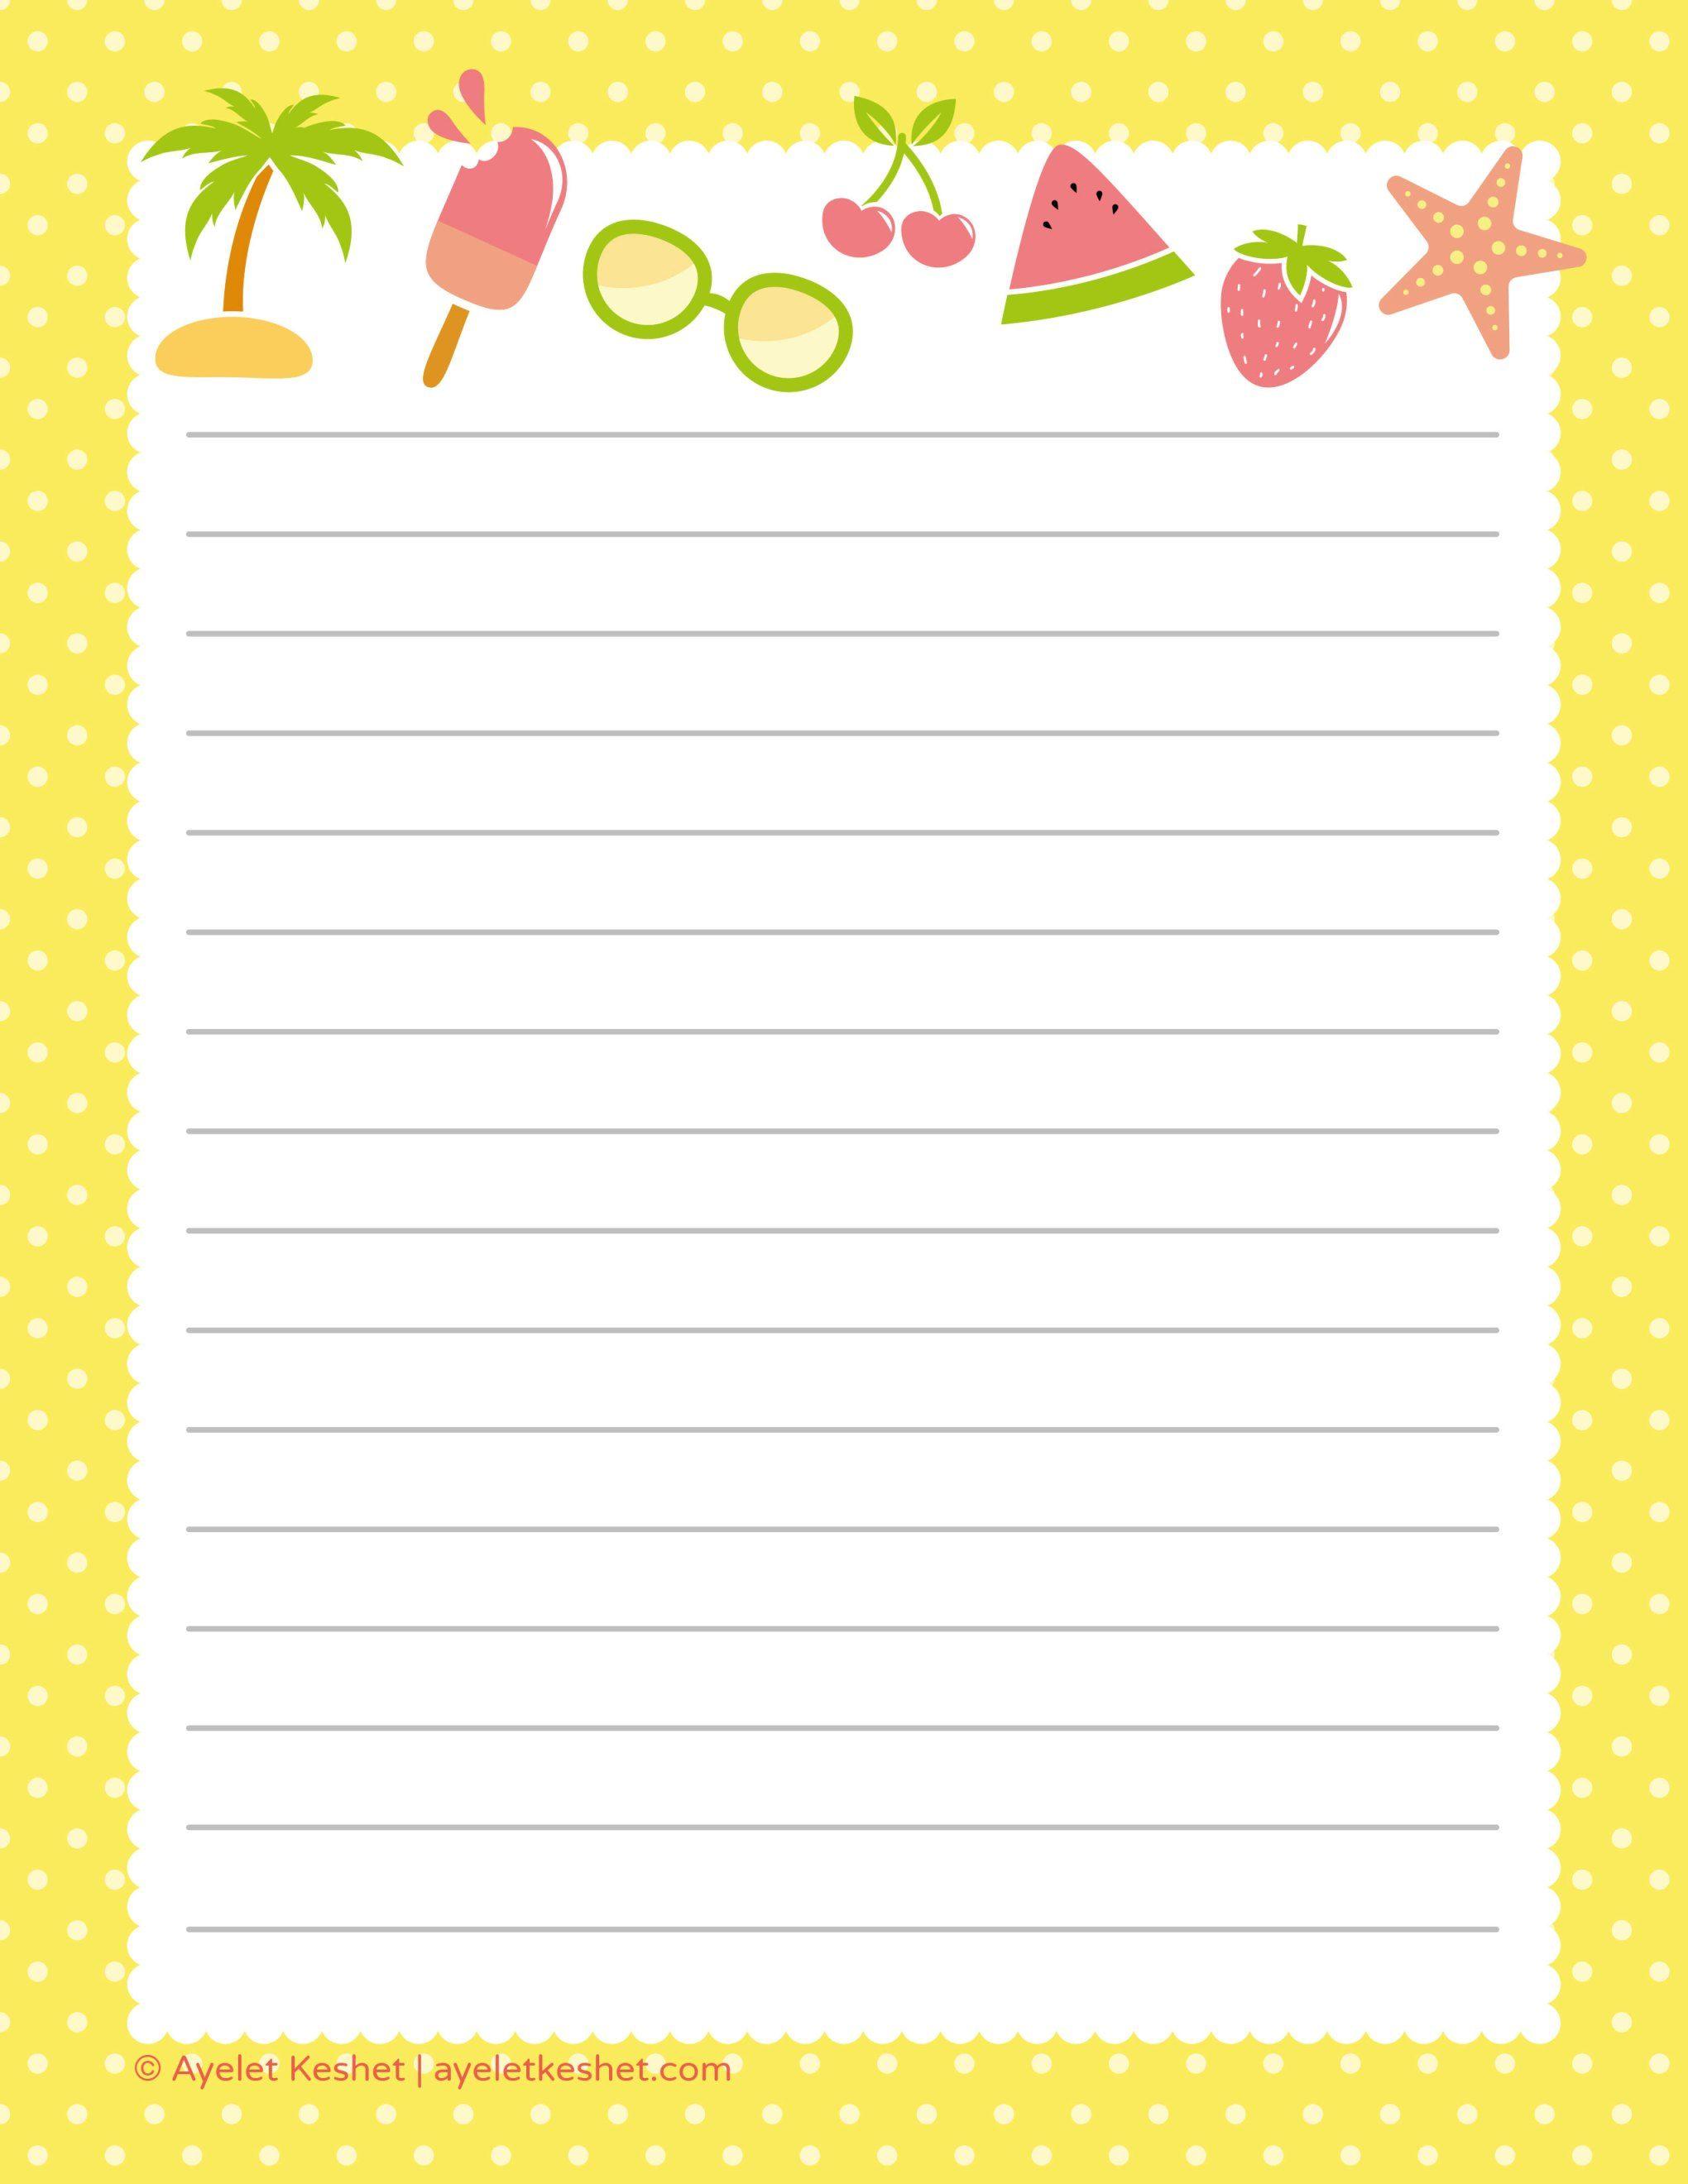 Free Printable Writing Paper Writing Paper Printable Writing